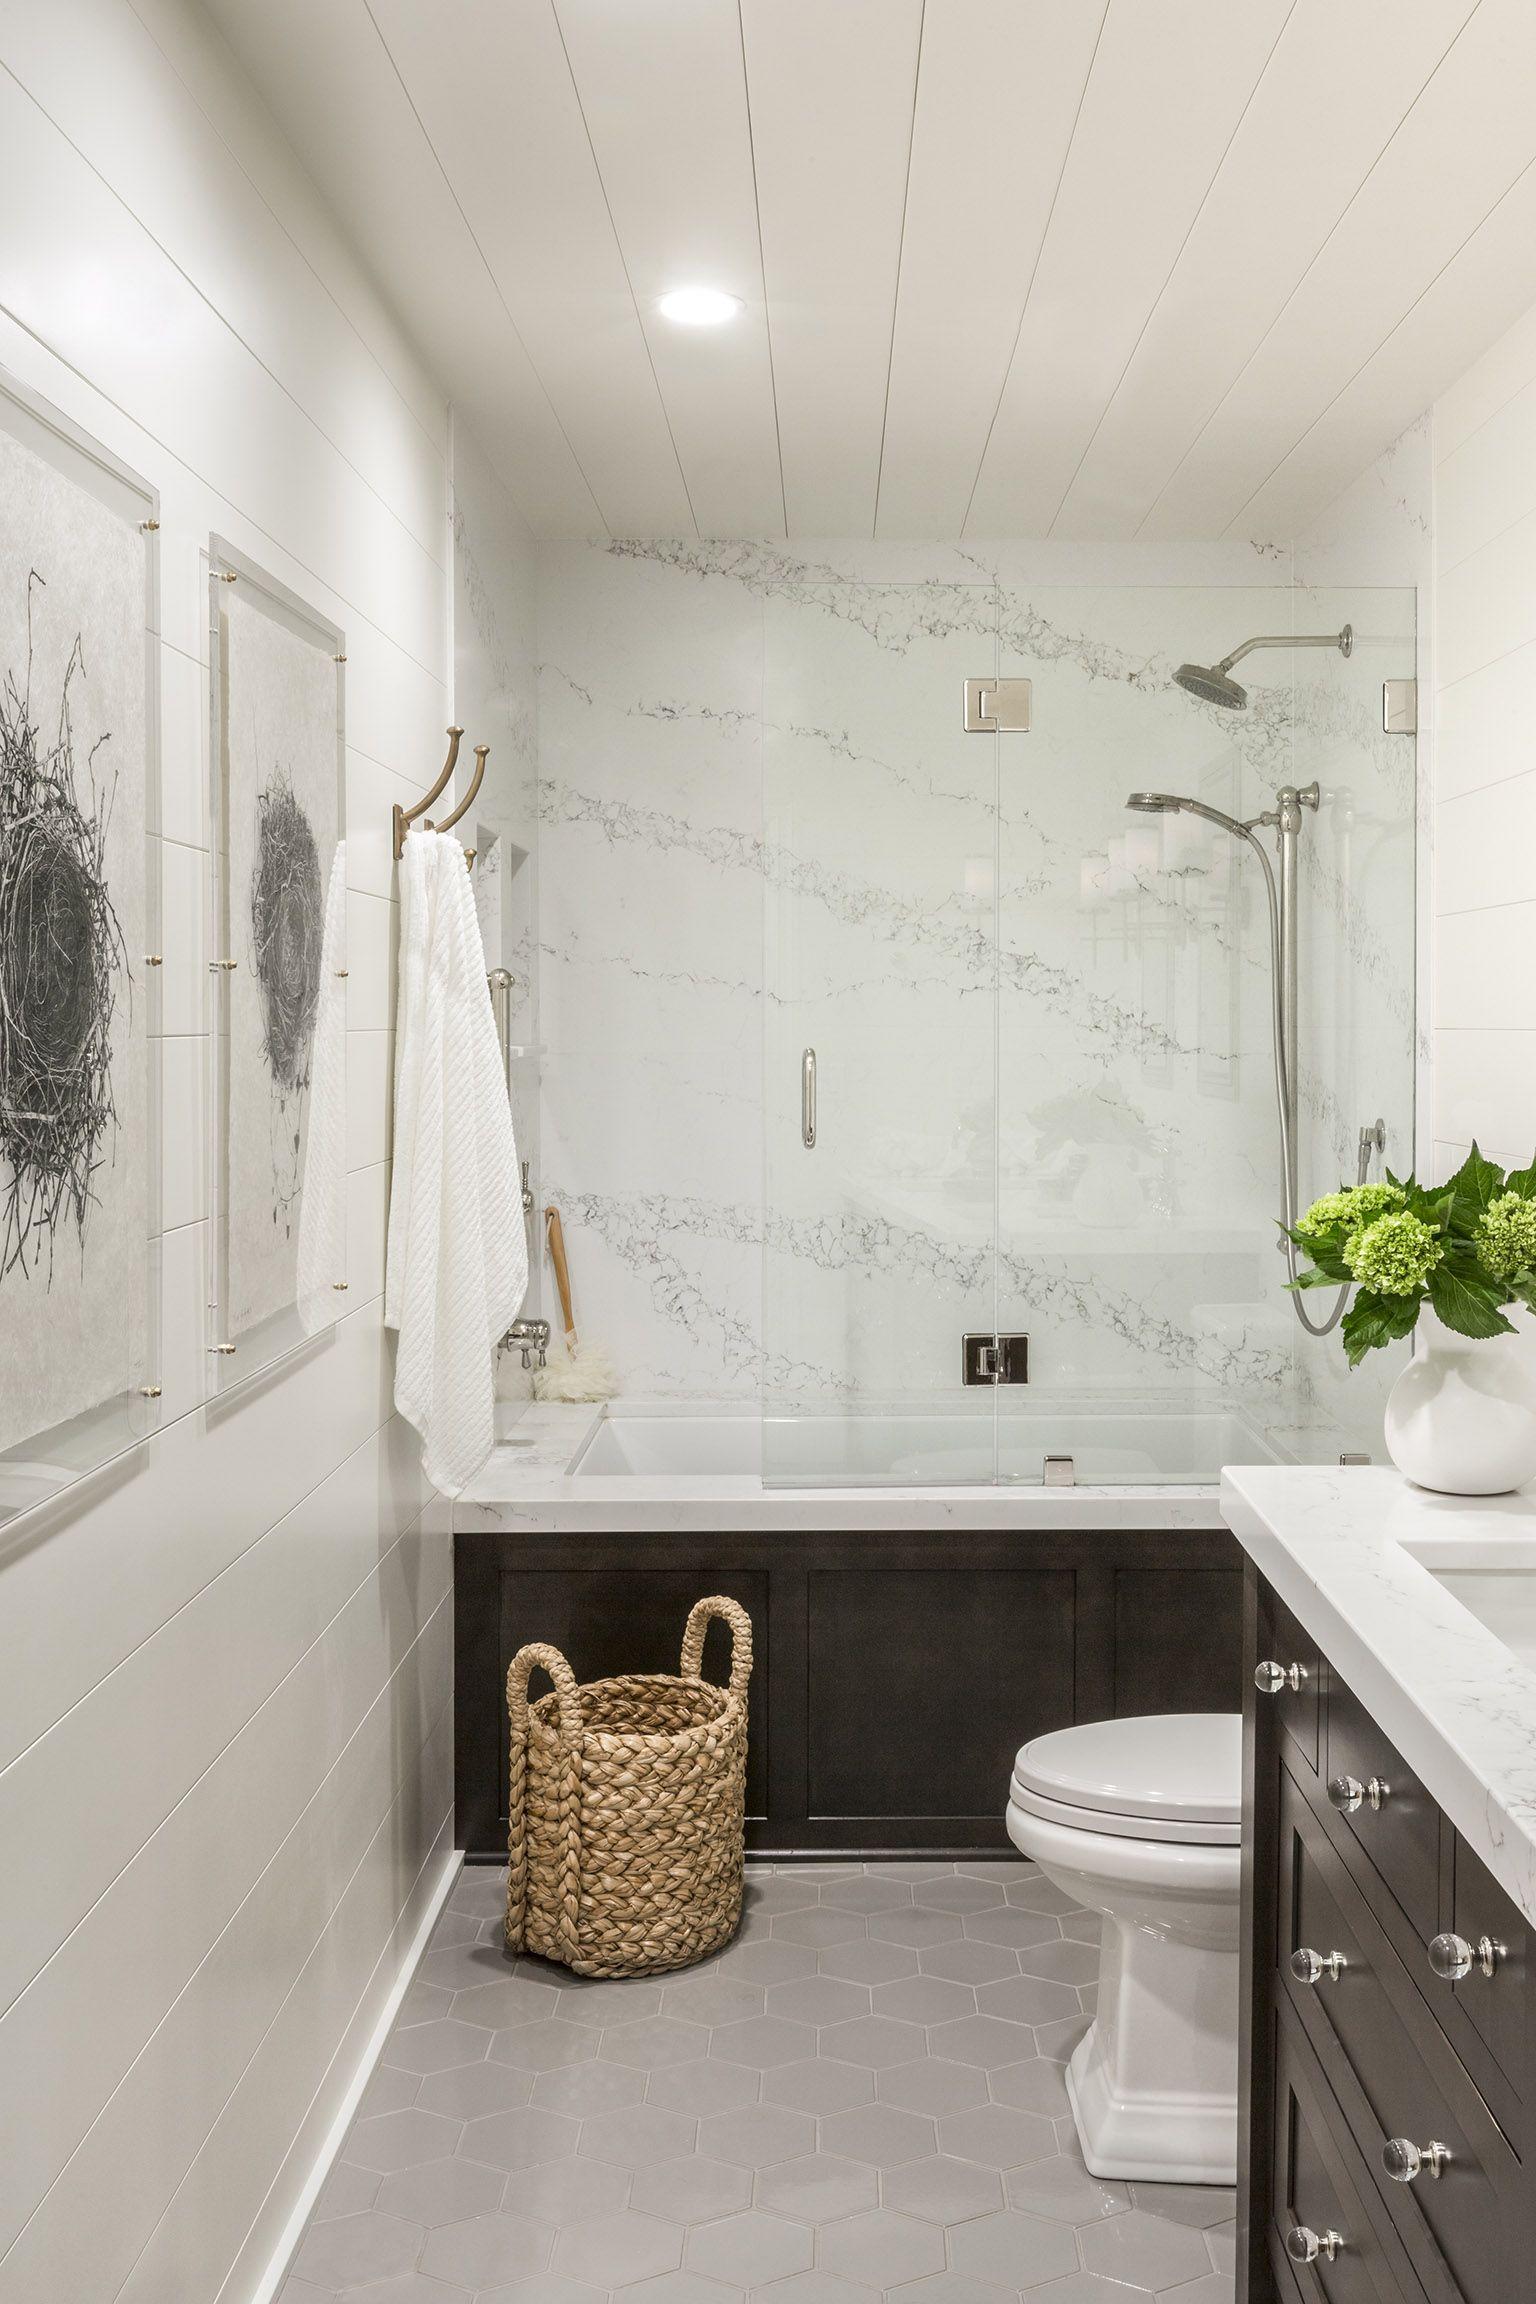 Best Kitchen Gallery: Hall Bathroom Remodel By R Cartwright Design Bathroom Design of Hall Bathroom Designs  on rachelxblog.com